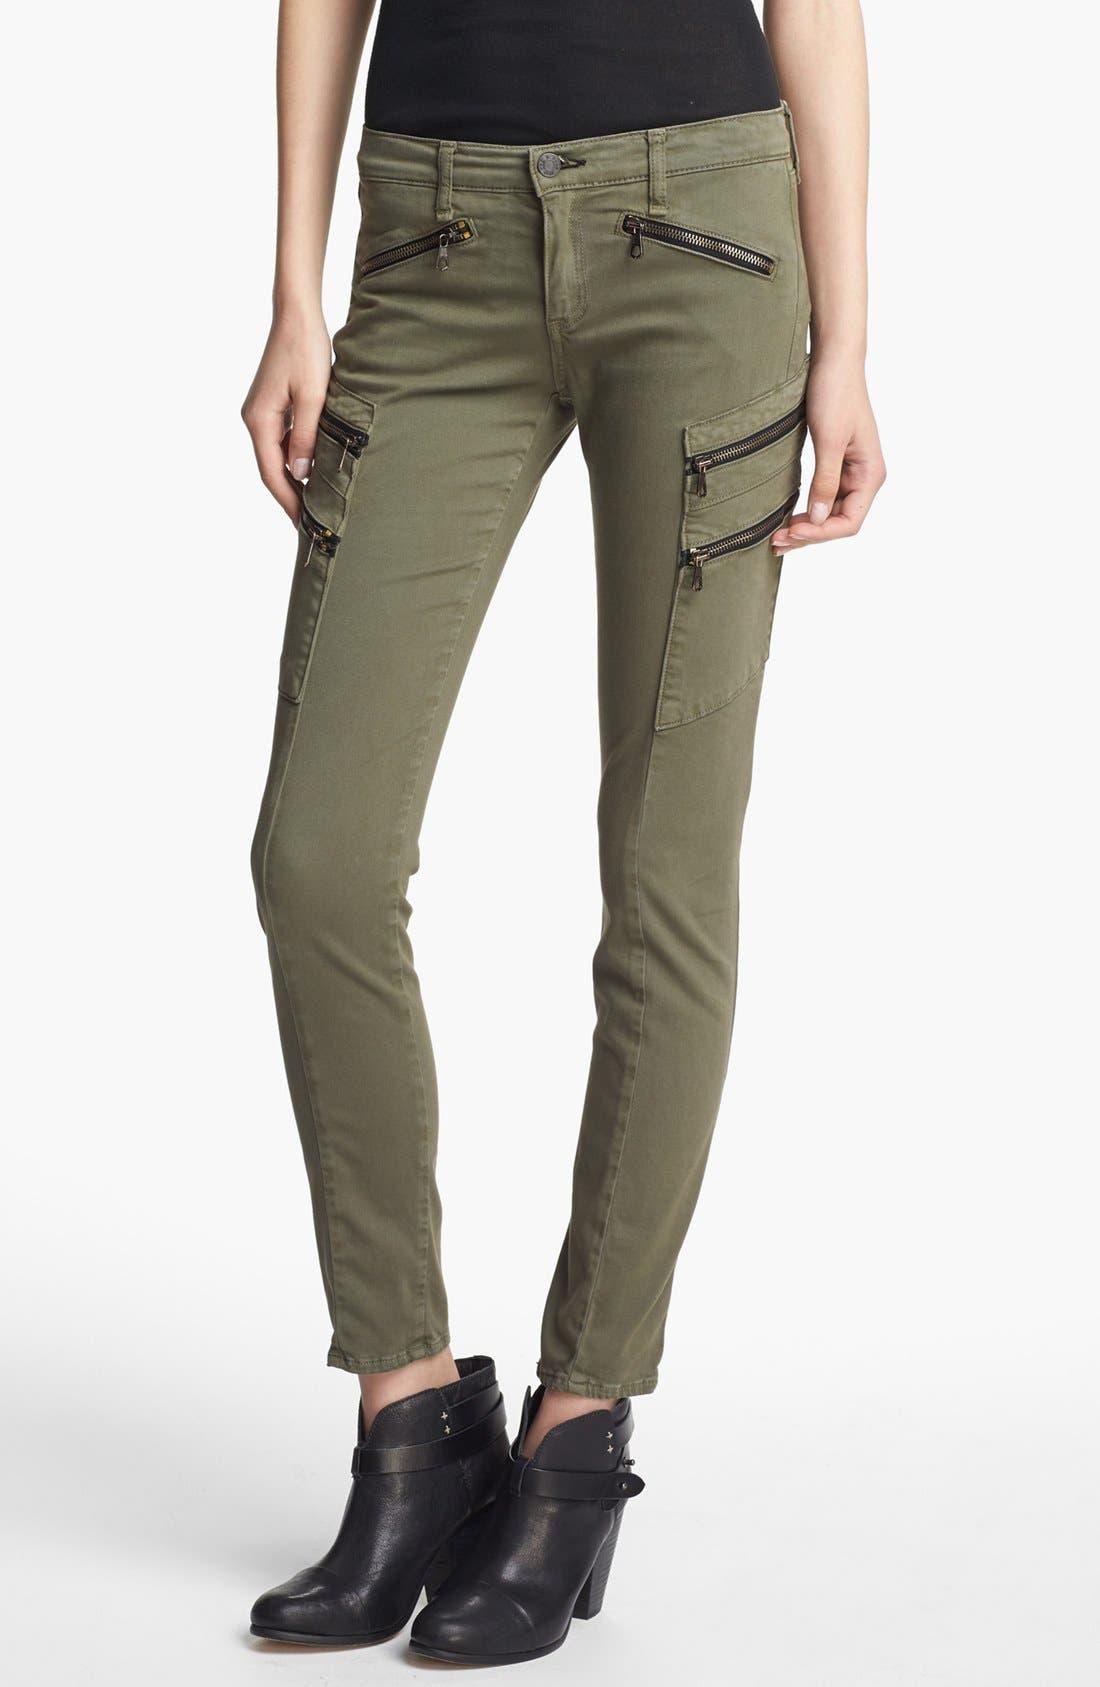 Alternate Image 1 Selected - rag & bone/JEAN 'Larit' Skinny Cargo Jeans